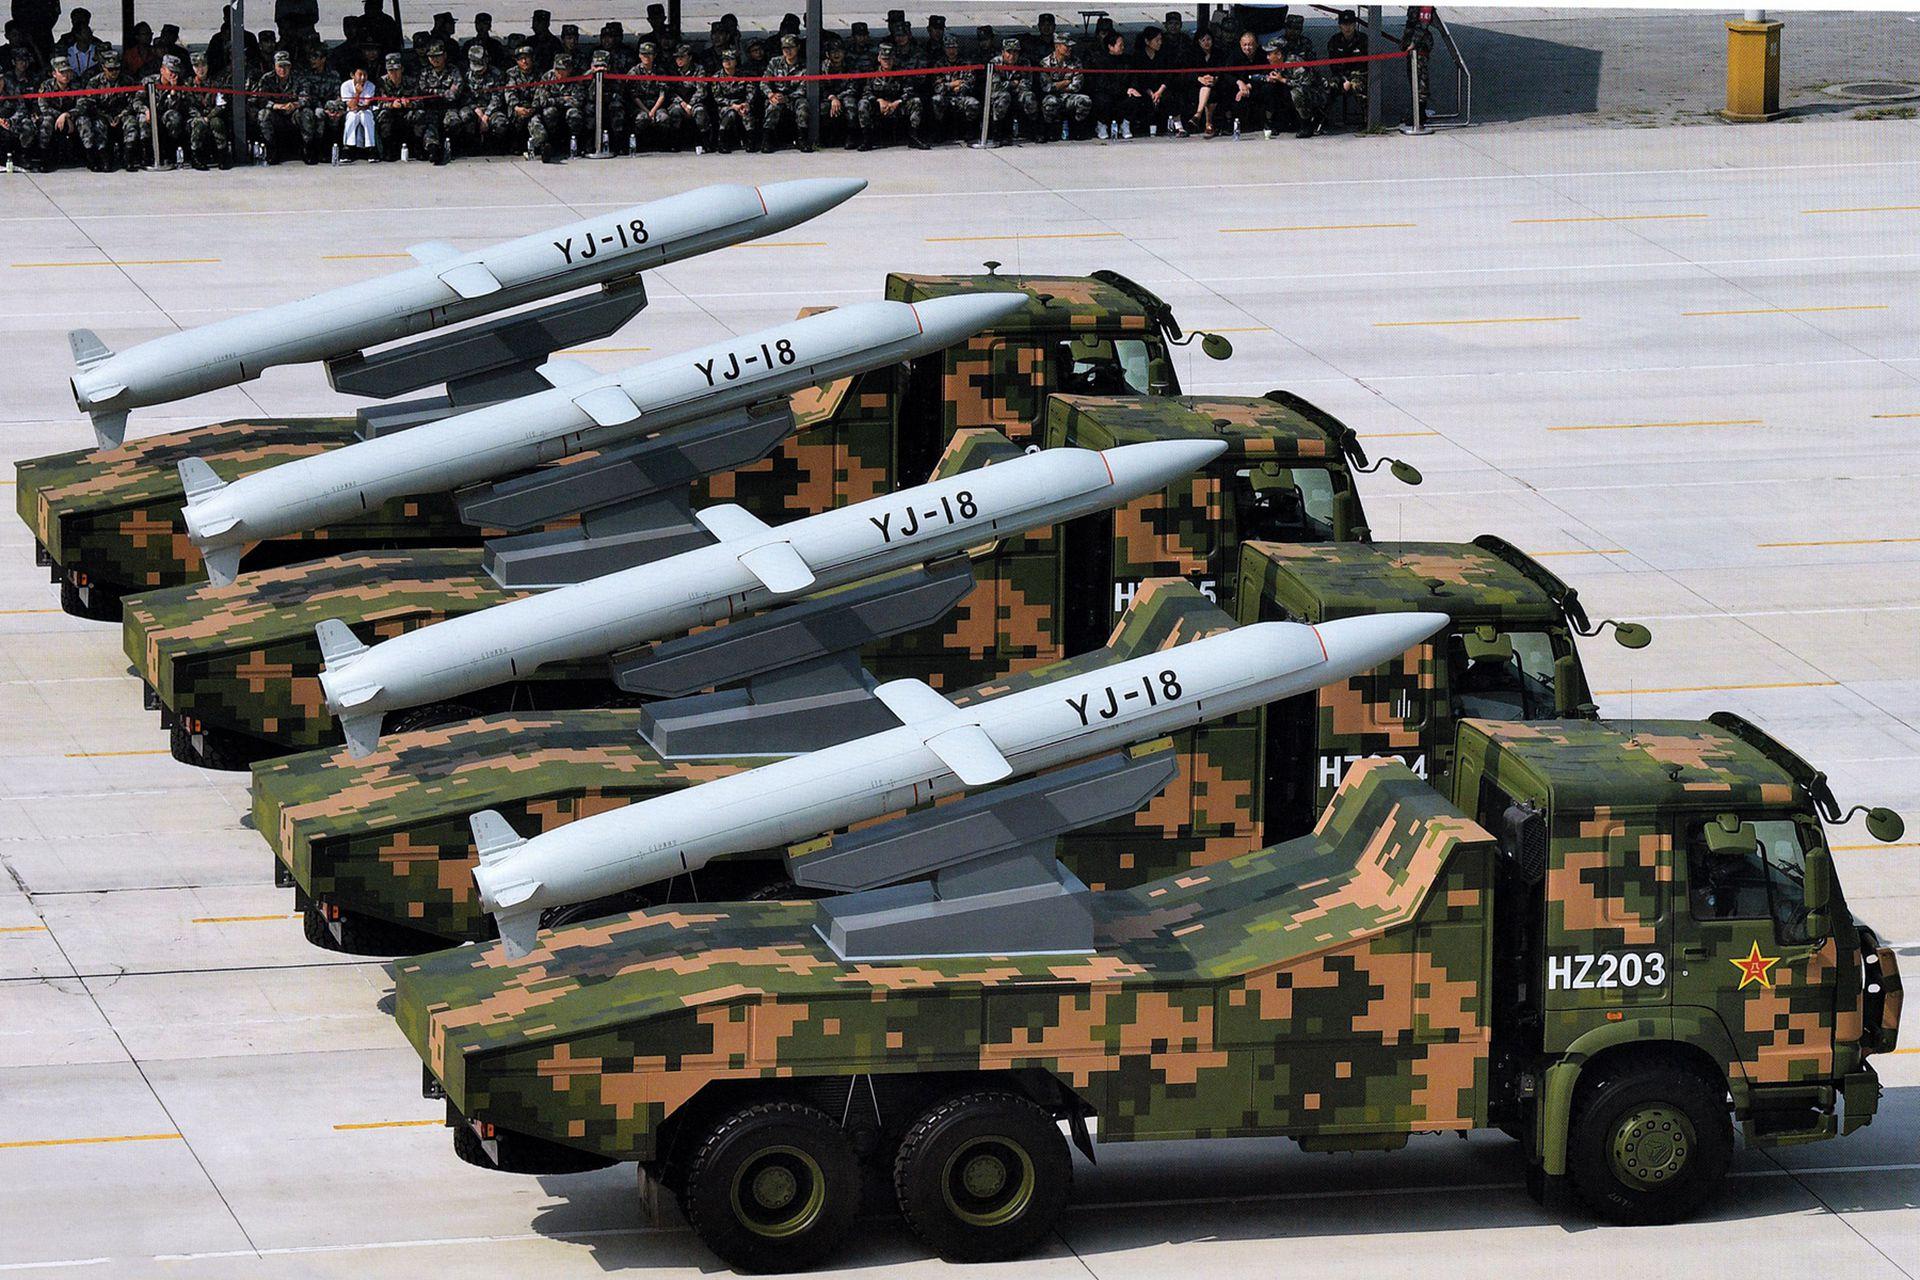 YJ-18 anti ship cruise missile